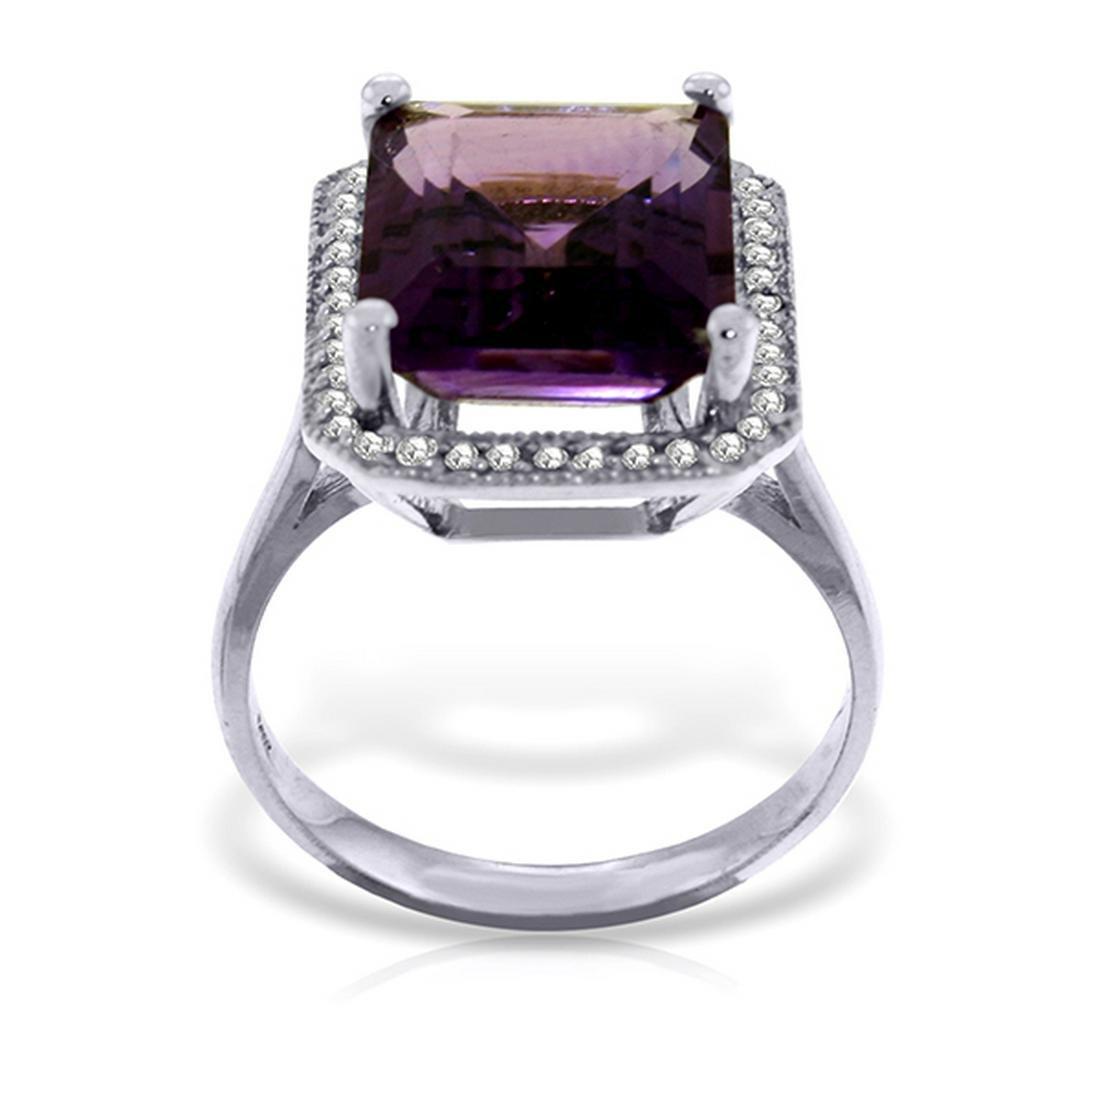 Genuine 5.8 ctw Amethyst & Diamond Ring Jewelry 14KT